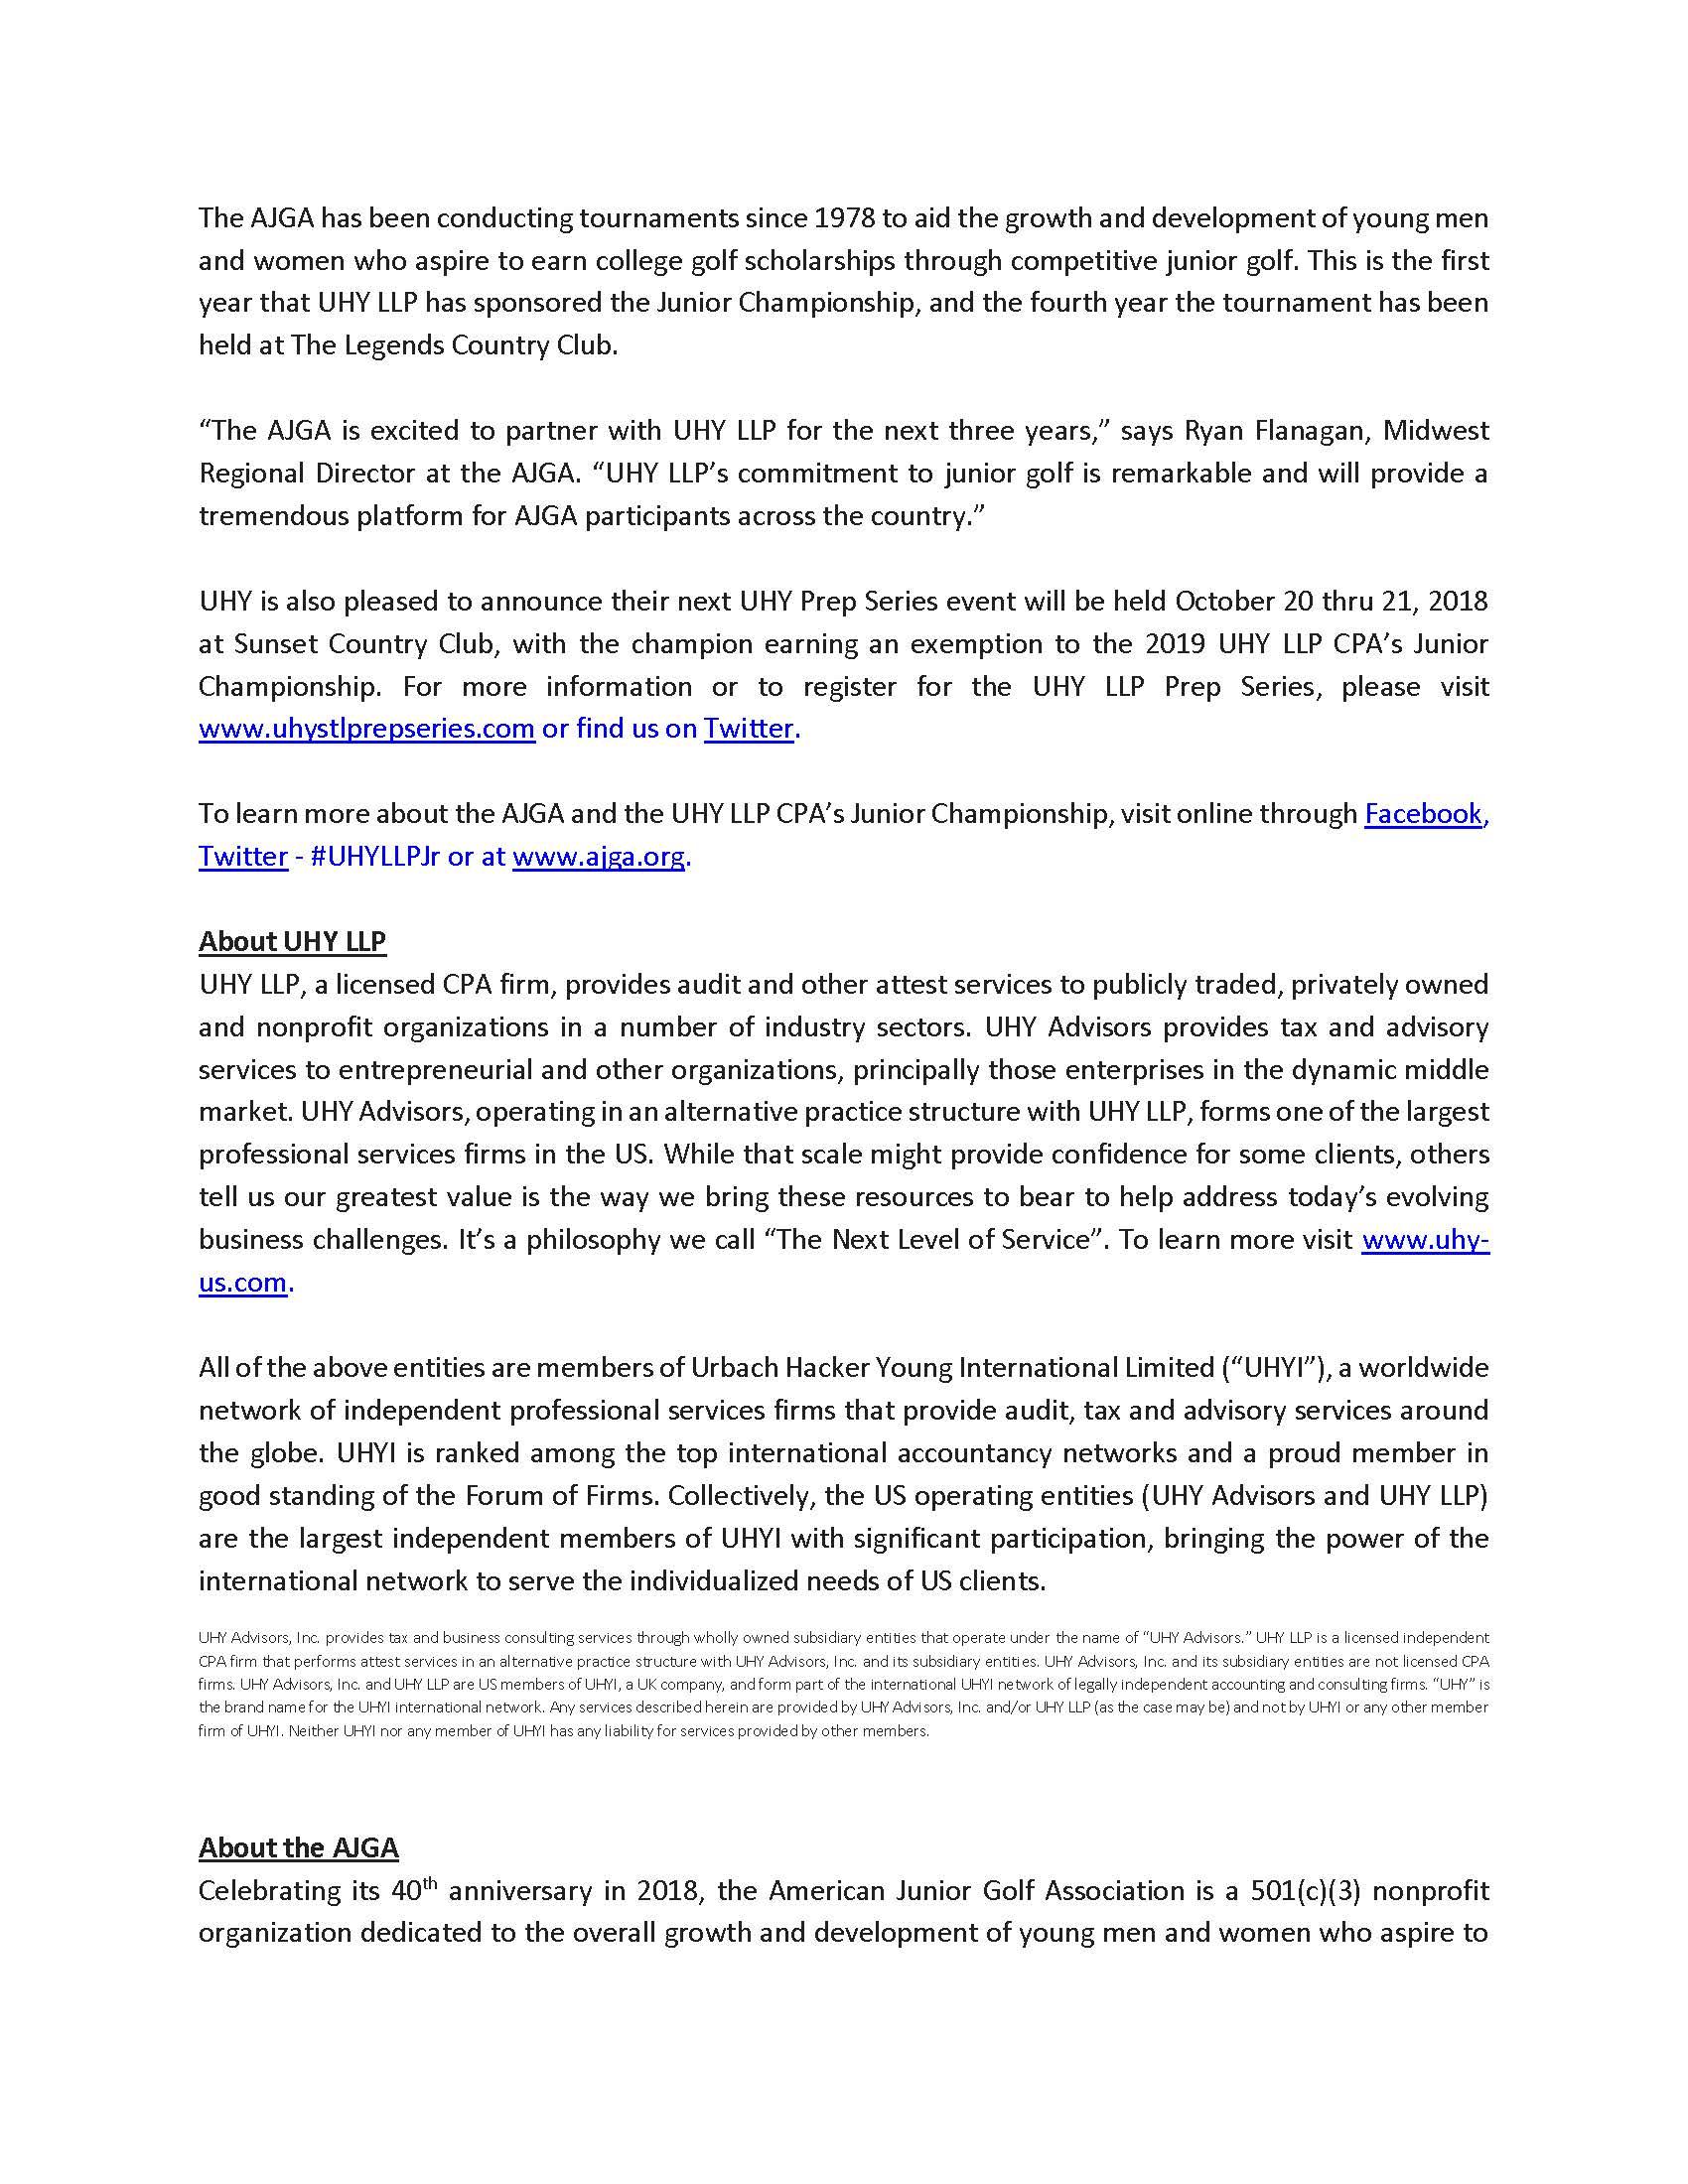 Junior Championship Release_v3FINAL (JUN 2018)_Page_2.jpg